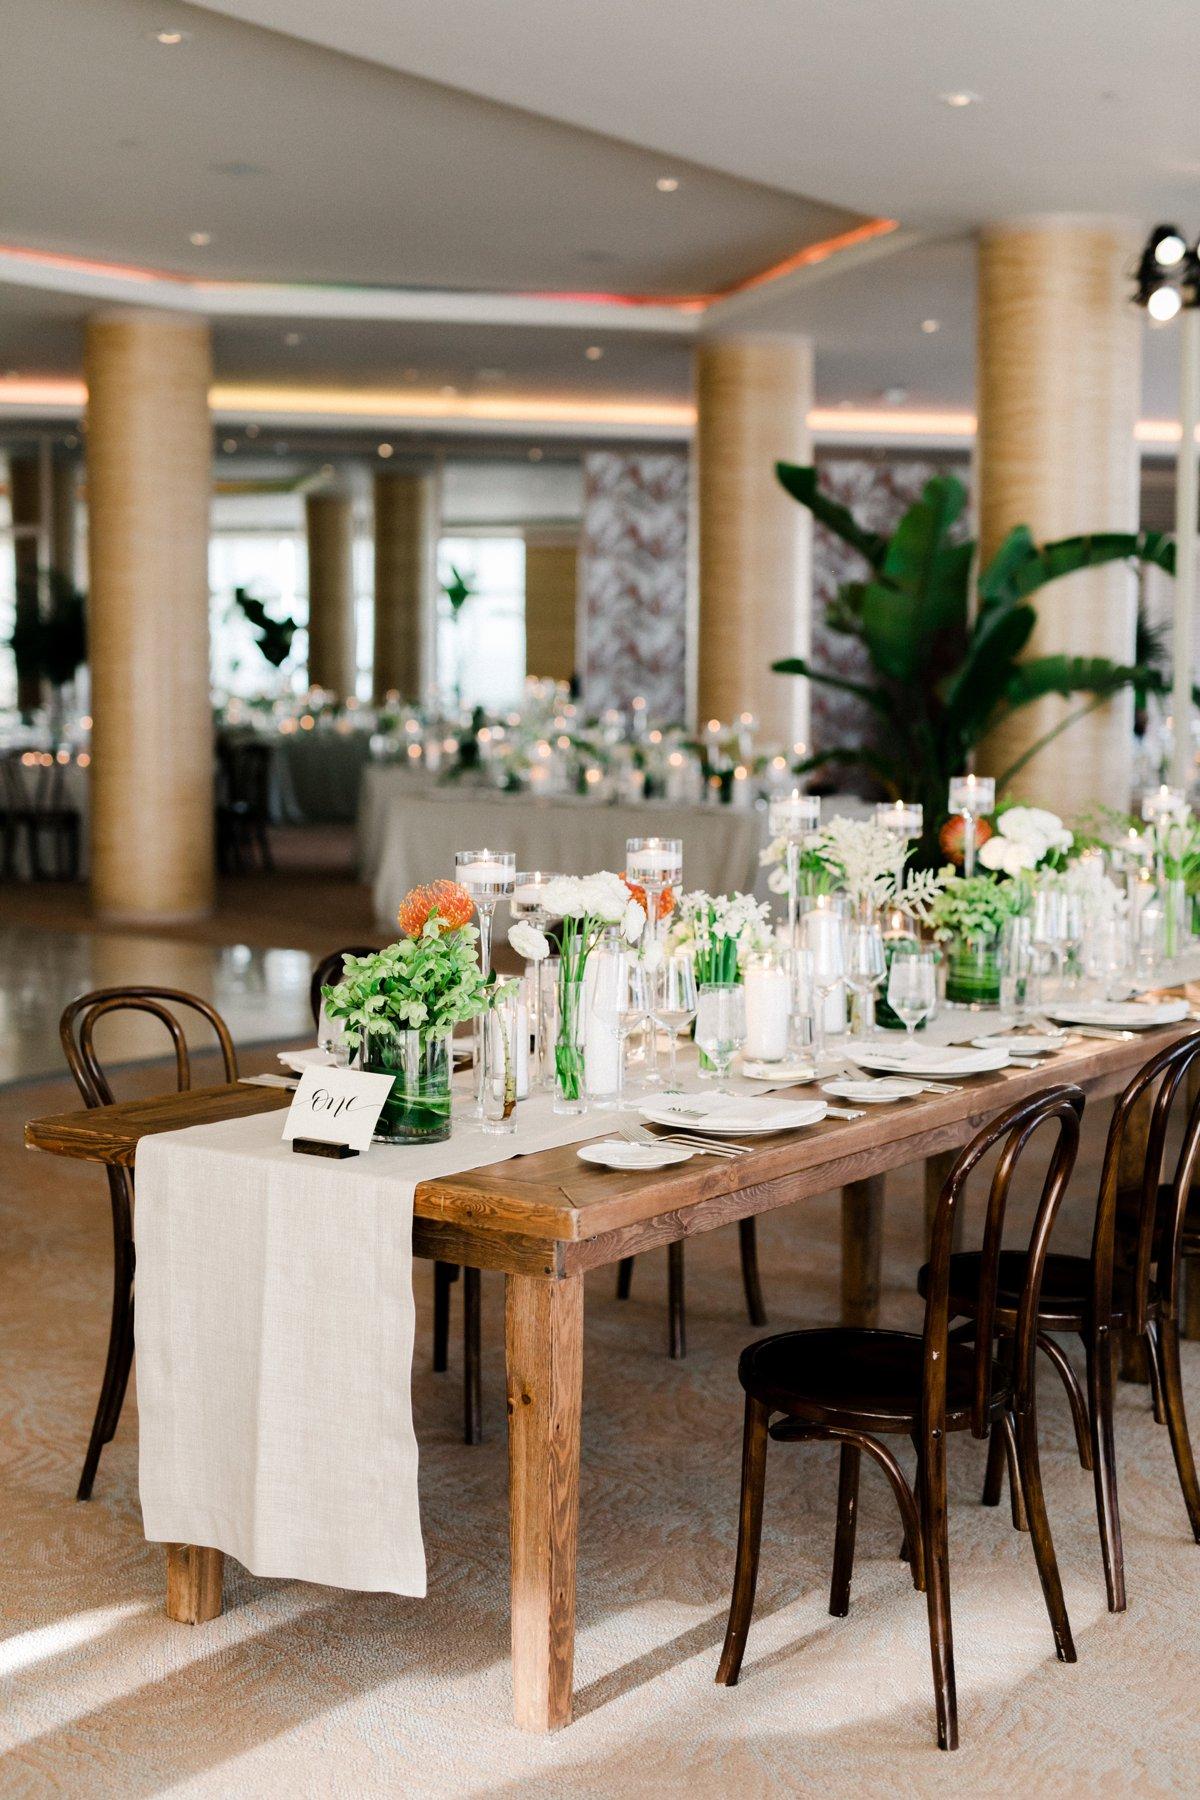 tropical inspired wedding receptions - photo by Anna Delores http://ruffledblog.com/chic-modern-wedding-at-four-seasons-santa-barbara